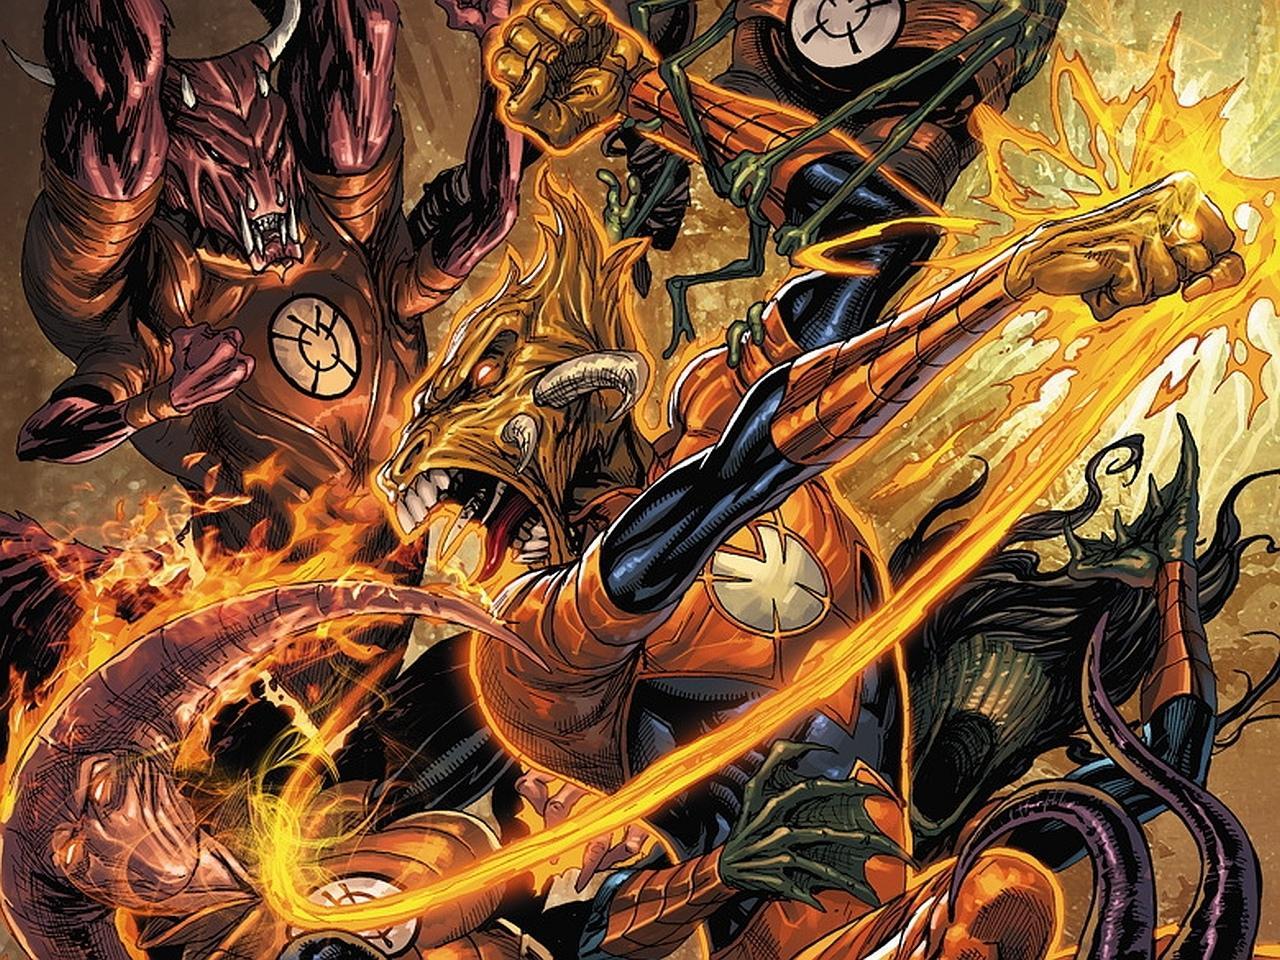 Larfleeze Comics wallpapers HD quality